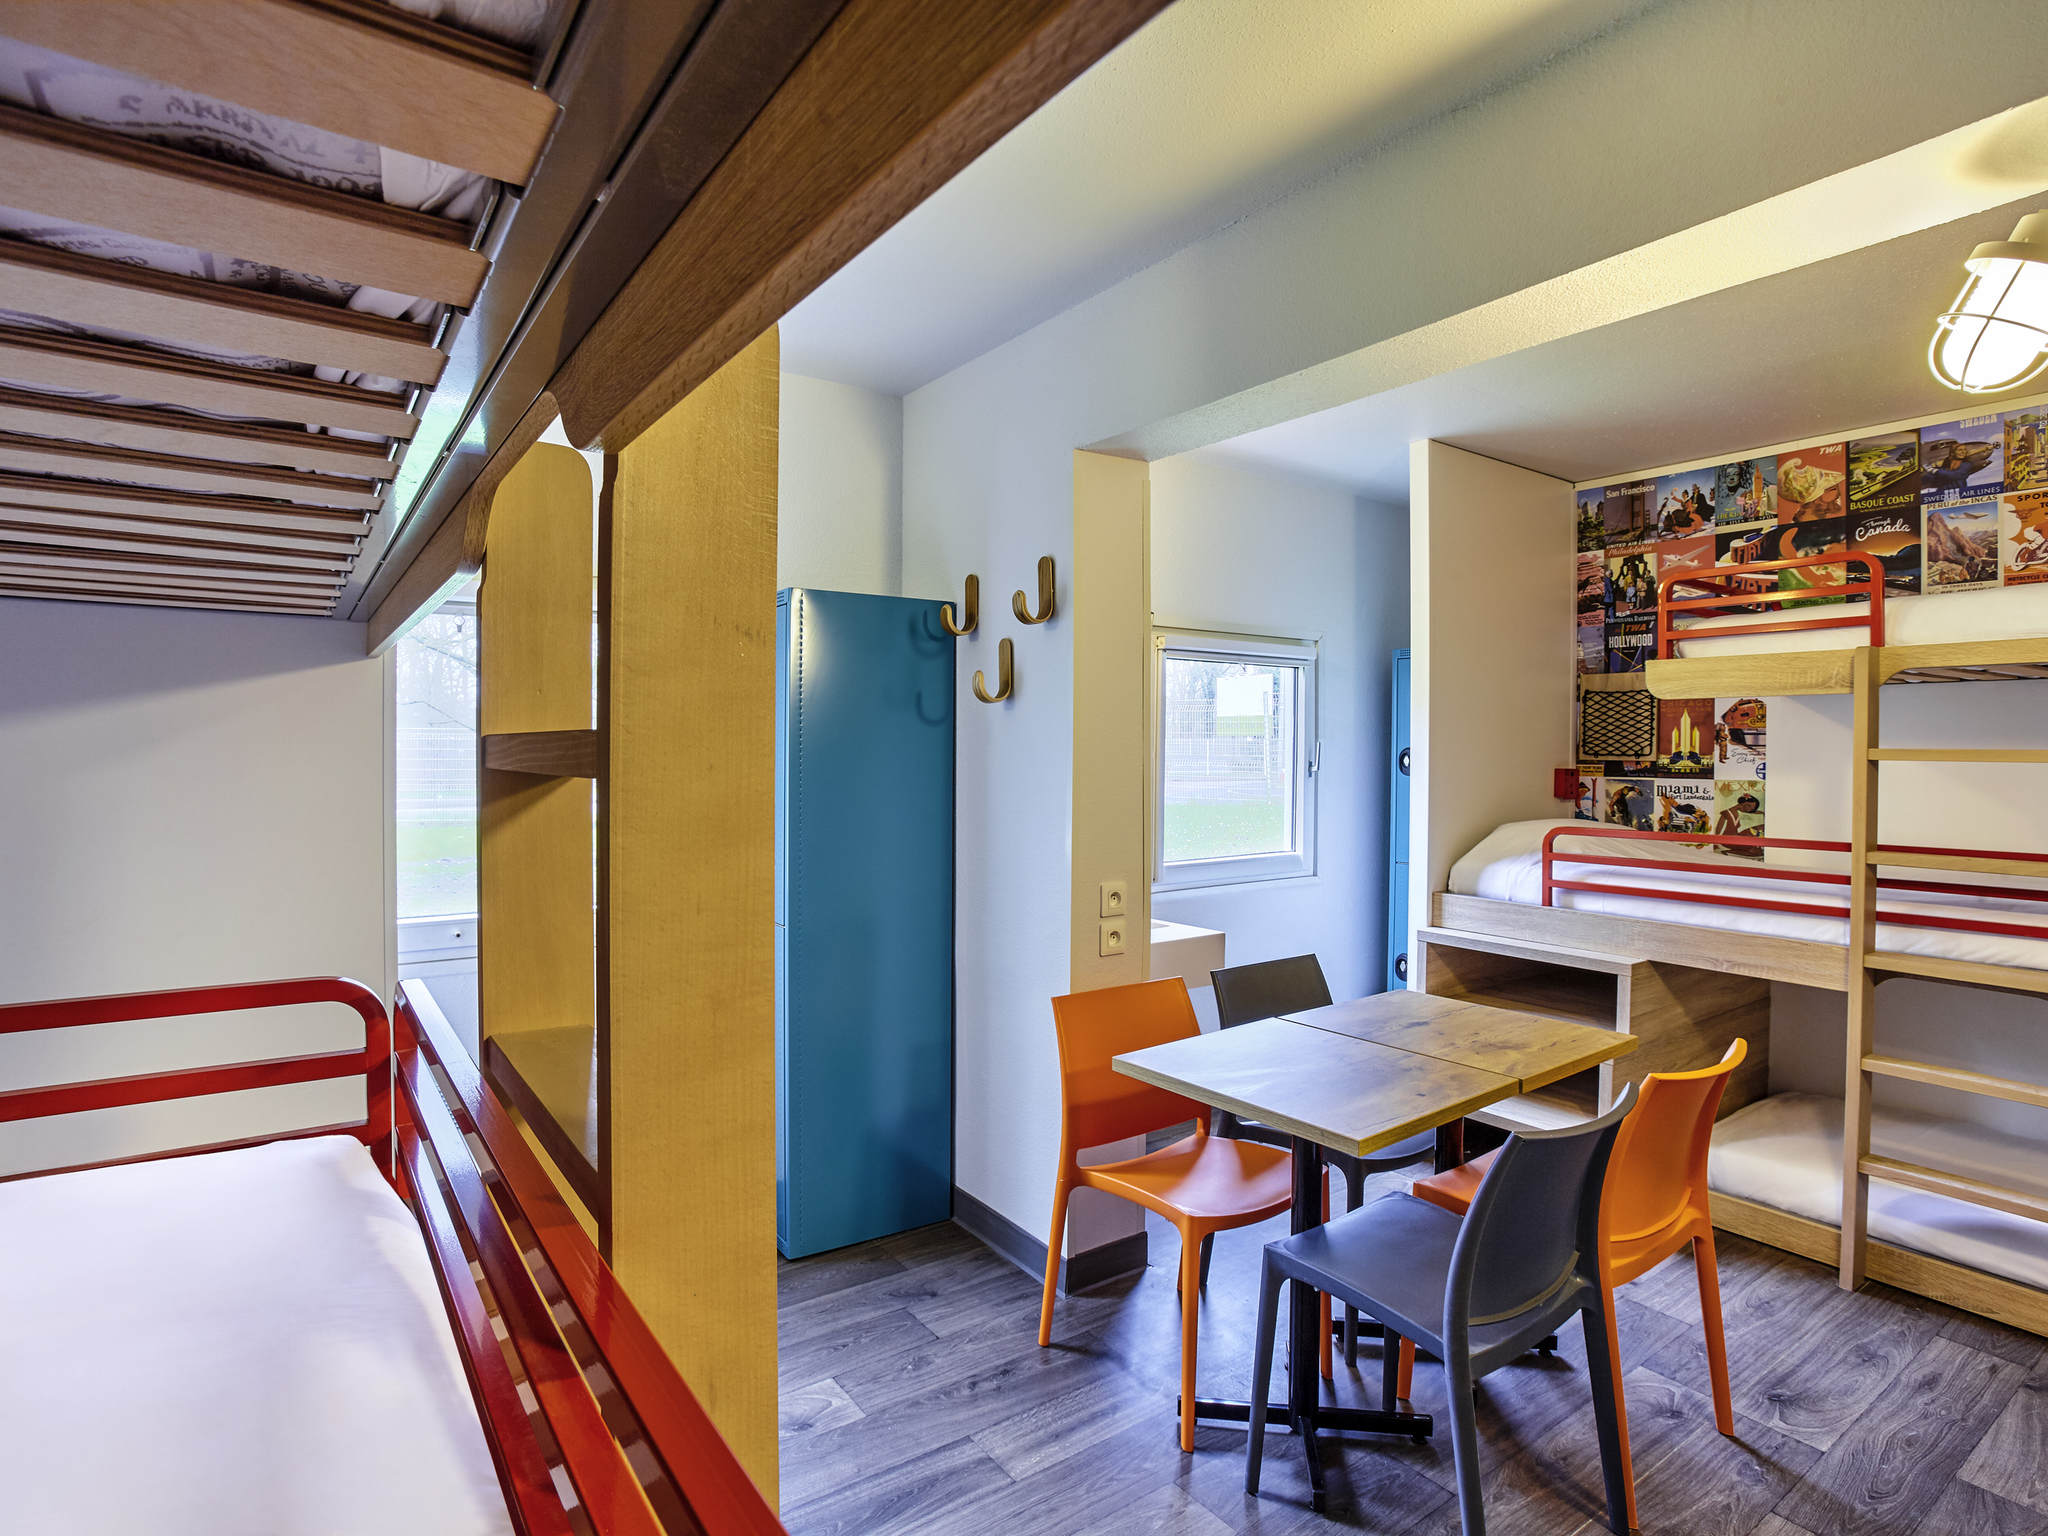 hotel tourcoing formule 1. Black Bedroom Furniture Sets. Home Design Ideas